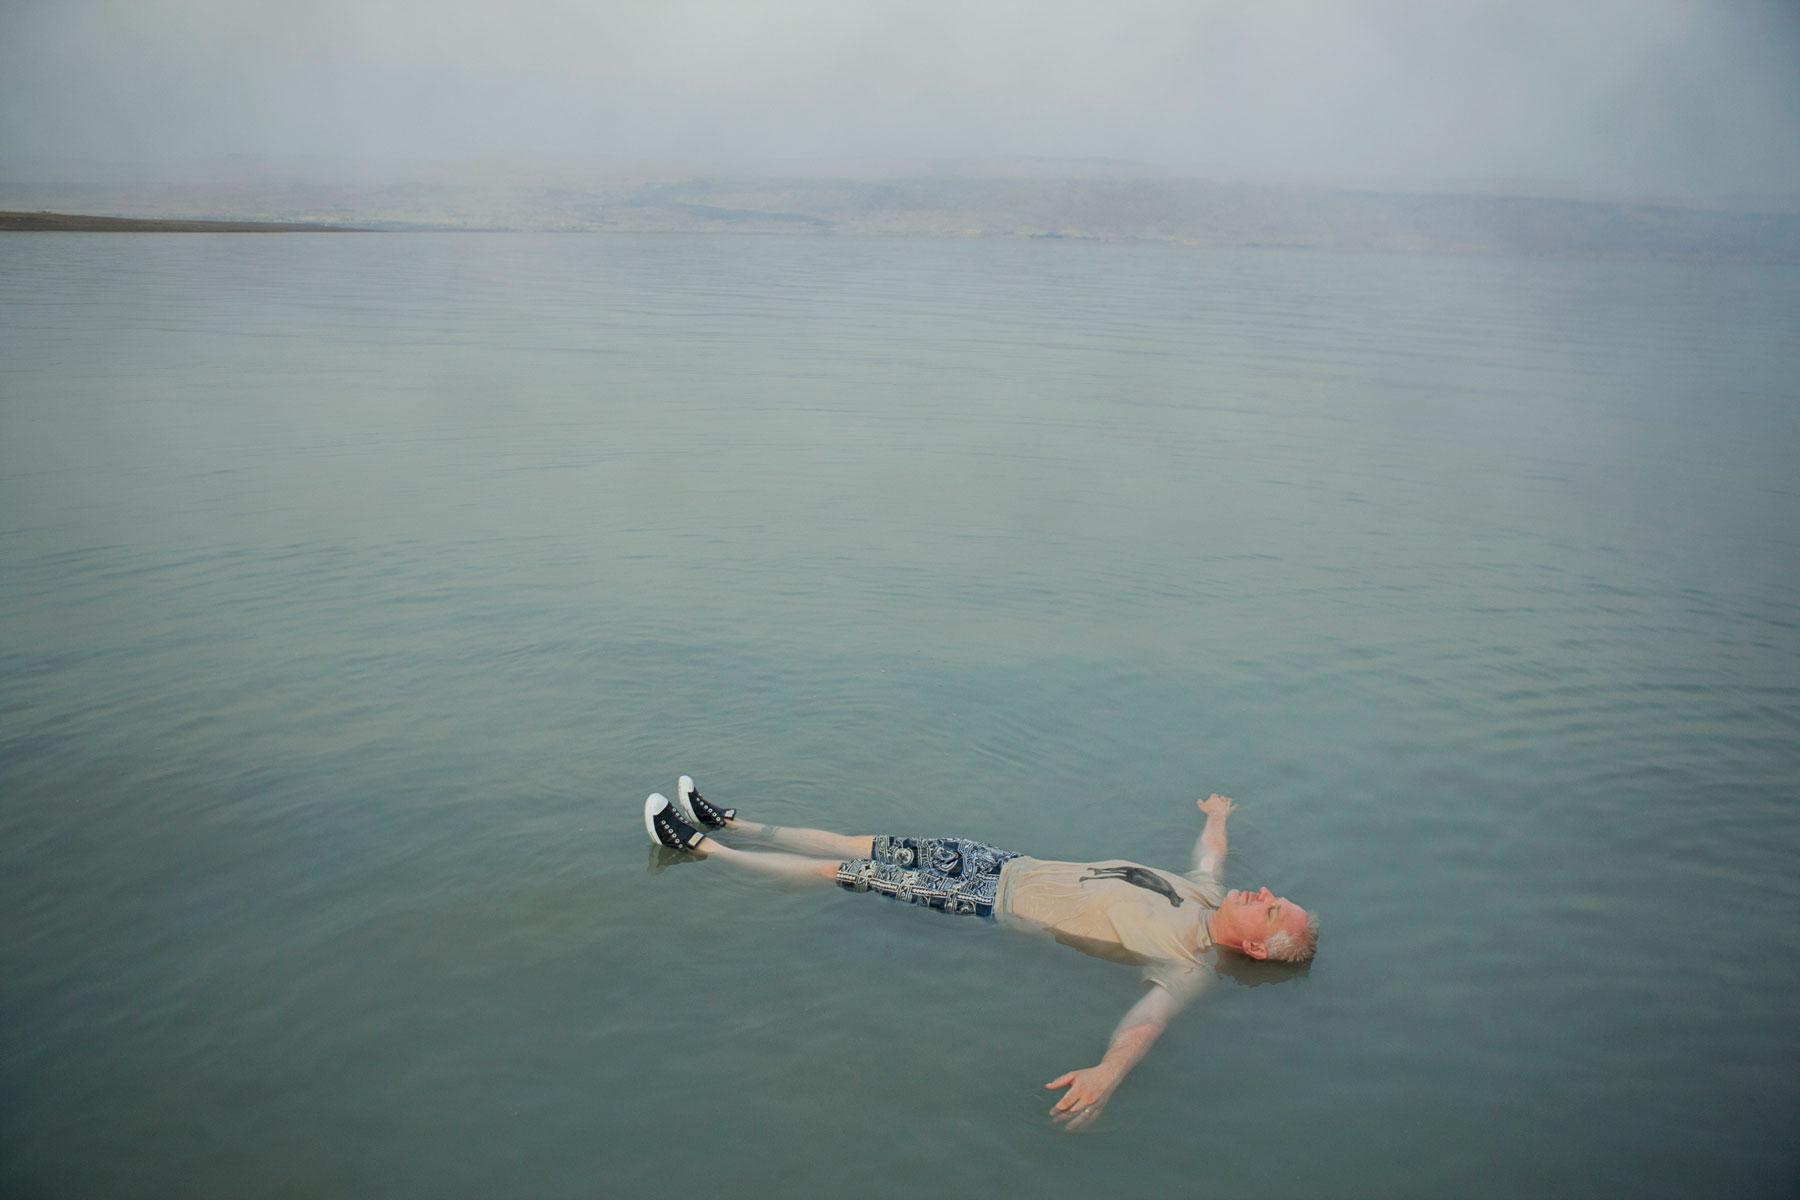 Israel_Dead_Sea_Glenn_Beck_George_Lange.jpg